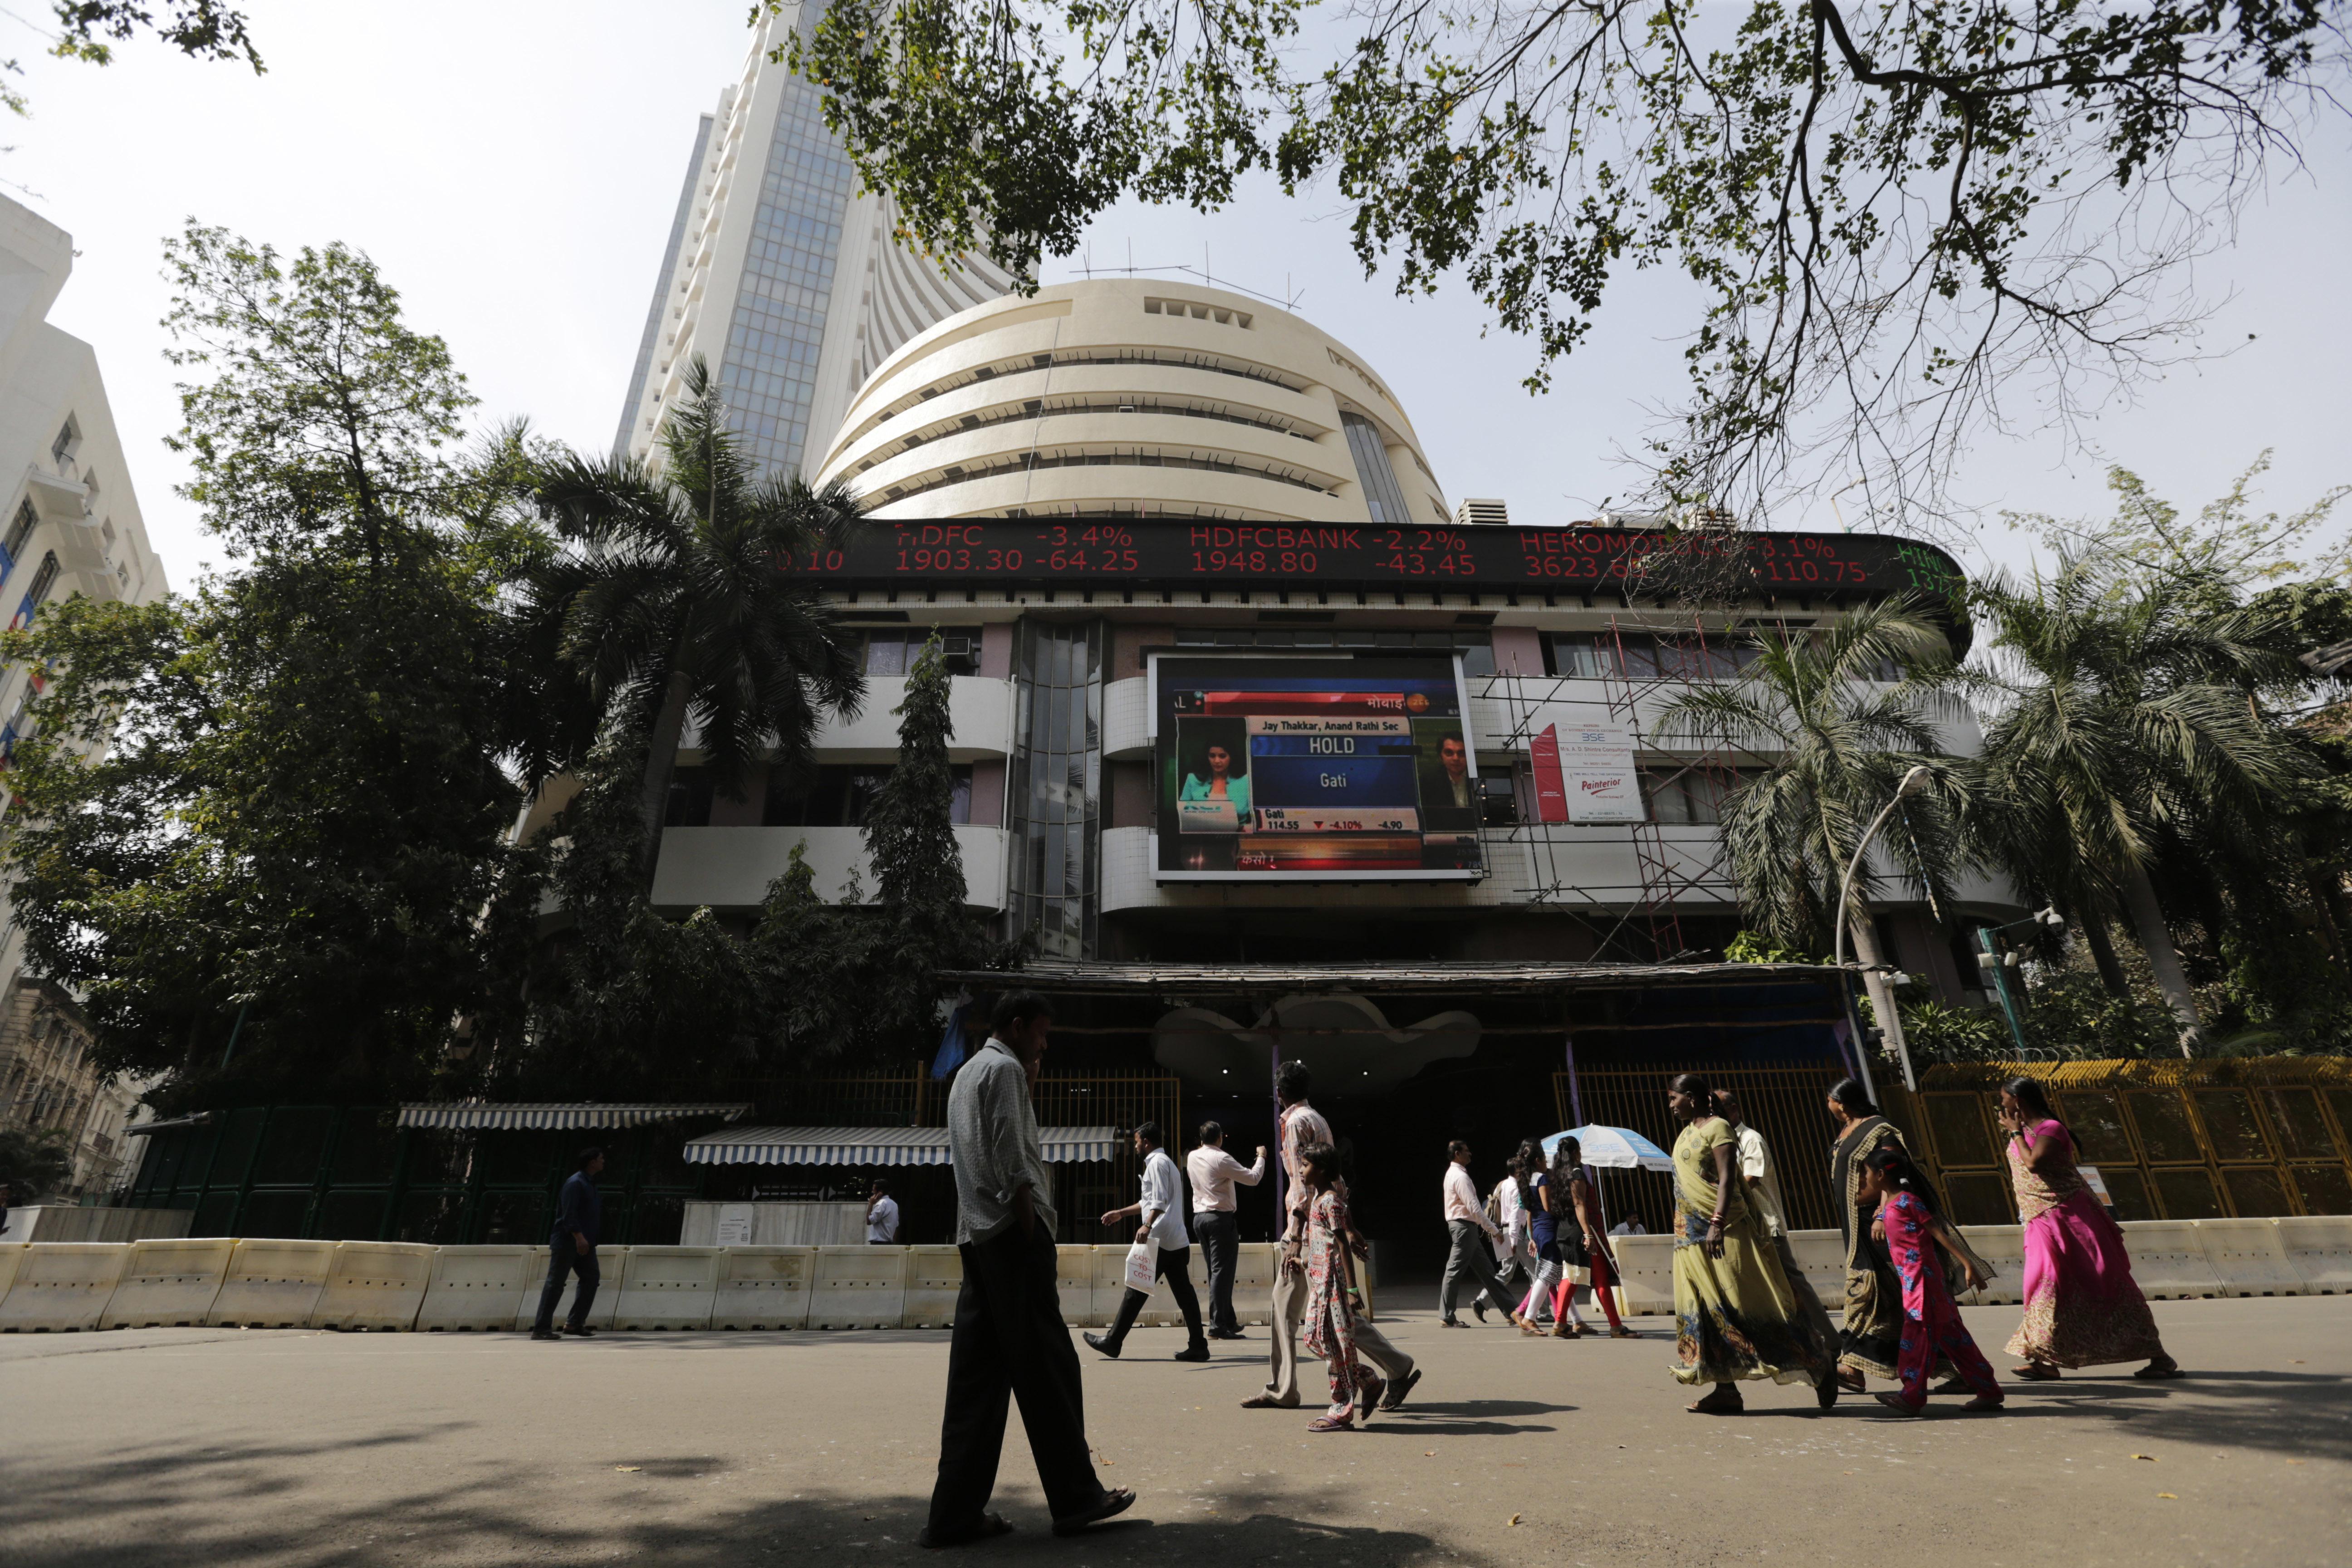 India Search Date 2018 10 01 Kopi Bubuk Asli Pagar Alam By Butik 3 Size Plg Bombay Stock Exchange Ap